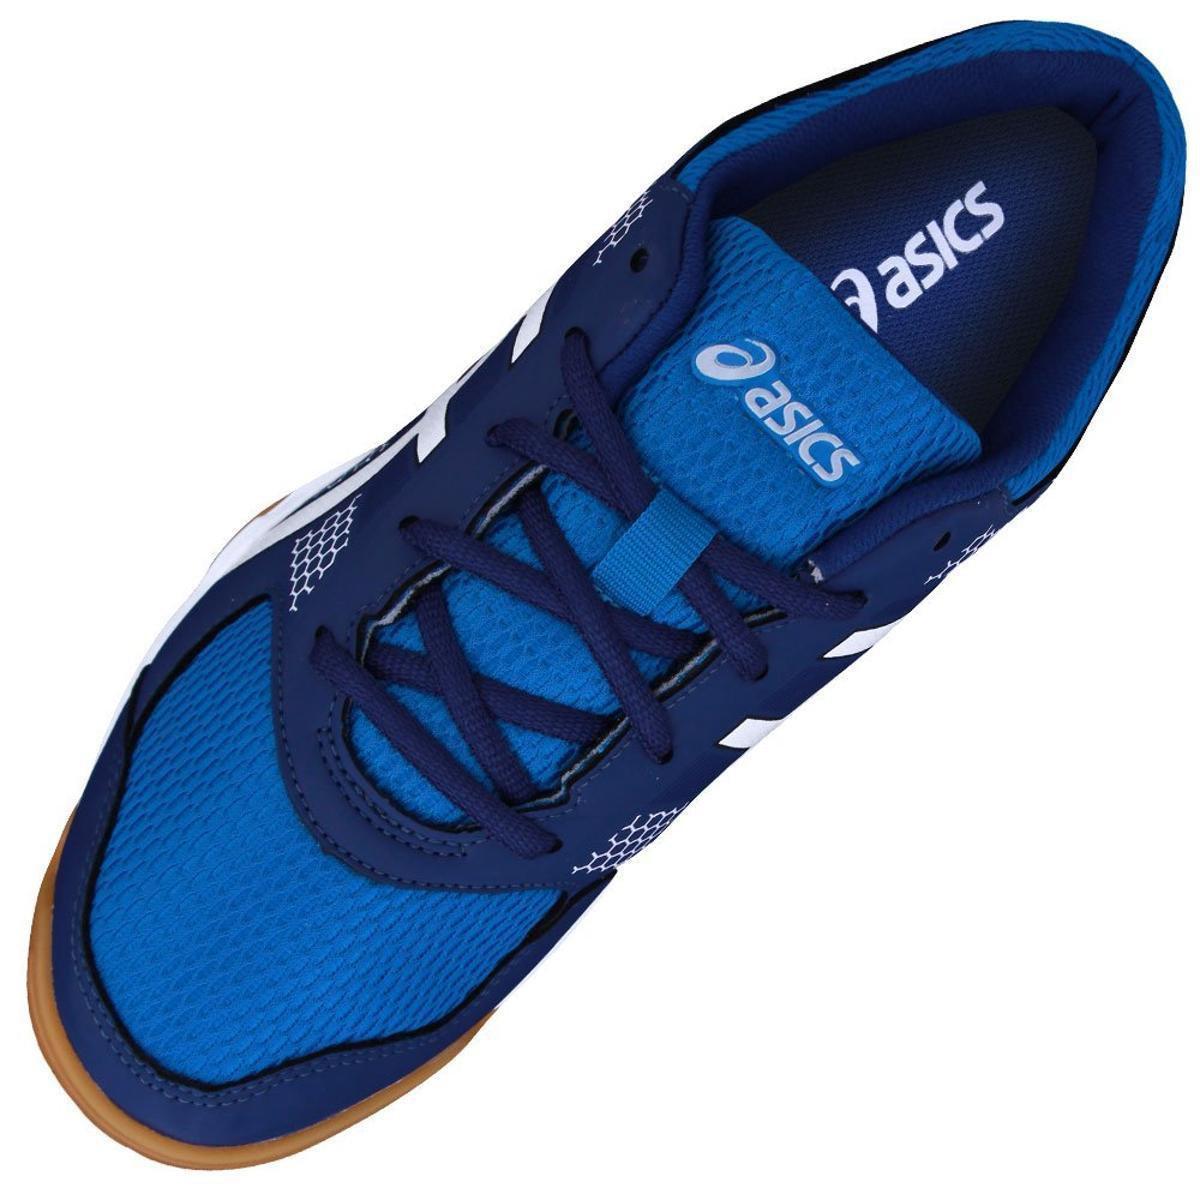 Tênis Asics Gel-Rocket 8A Masculino - Azul e Branco - Compre Agora ... 5b82636b69186